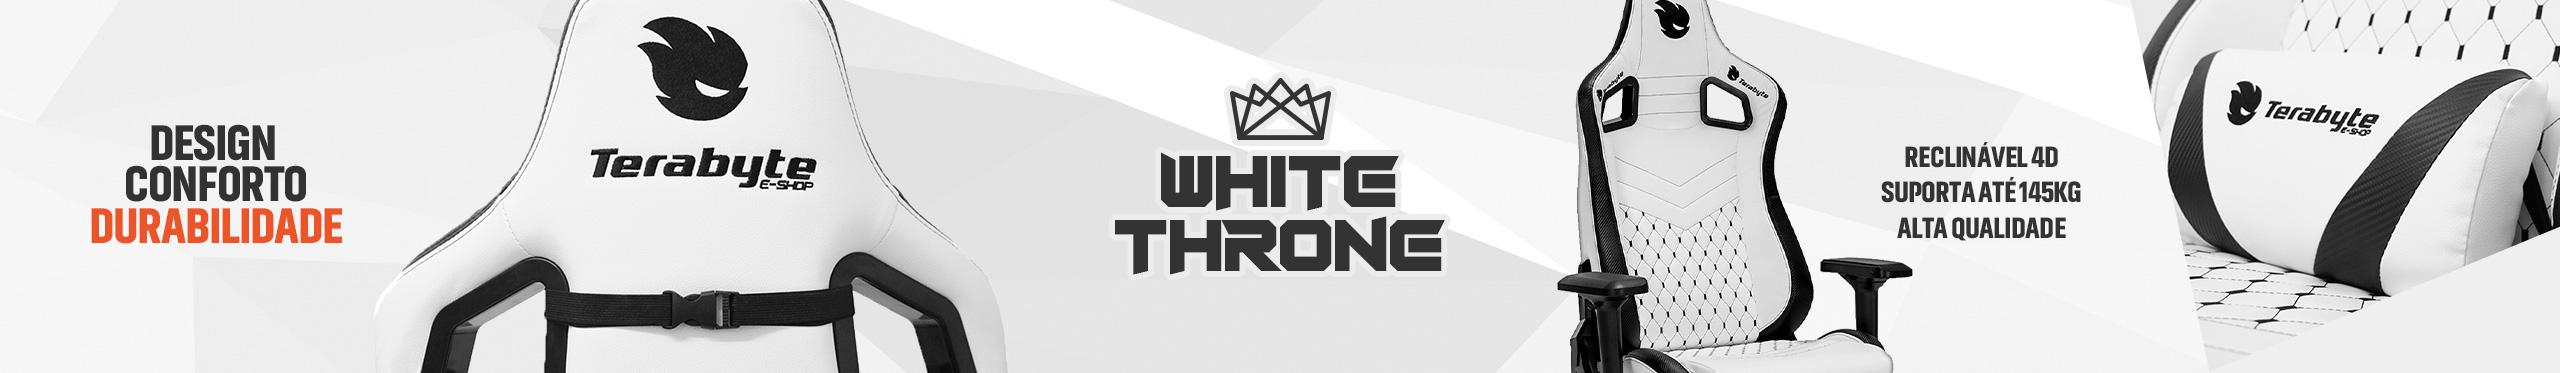 Terabyte White Throne. O verdadeiro trono dos gamers.